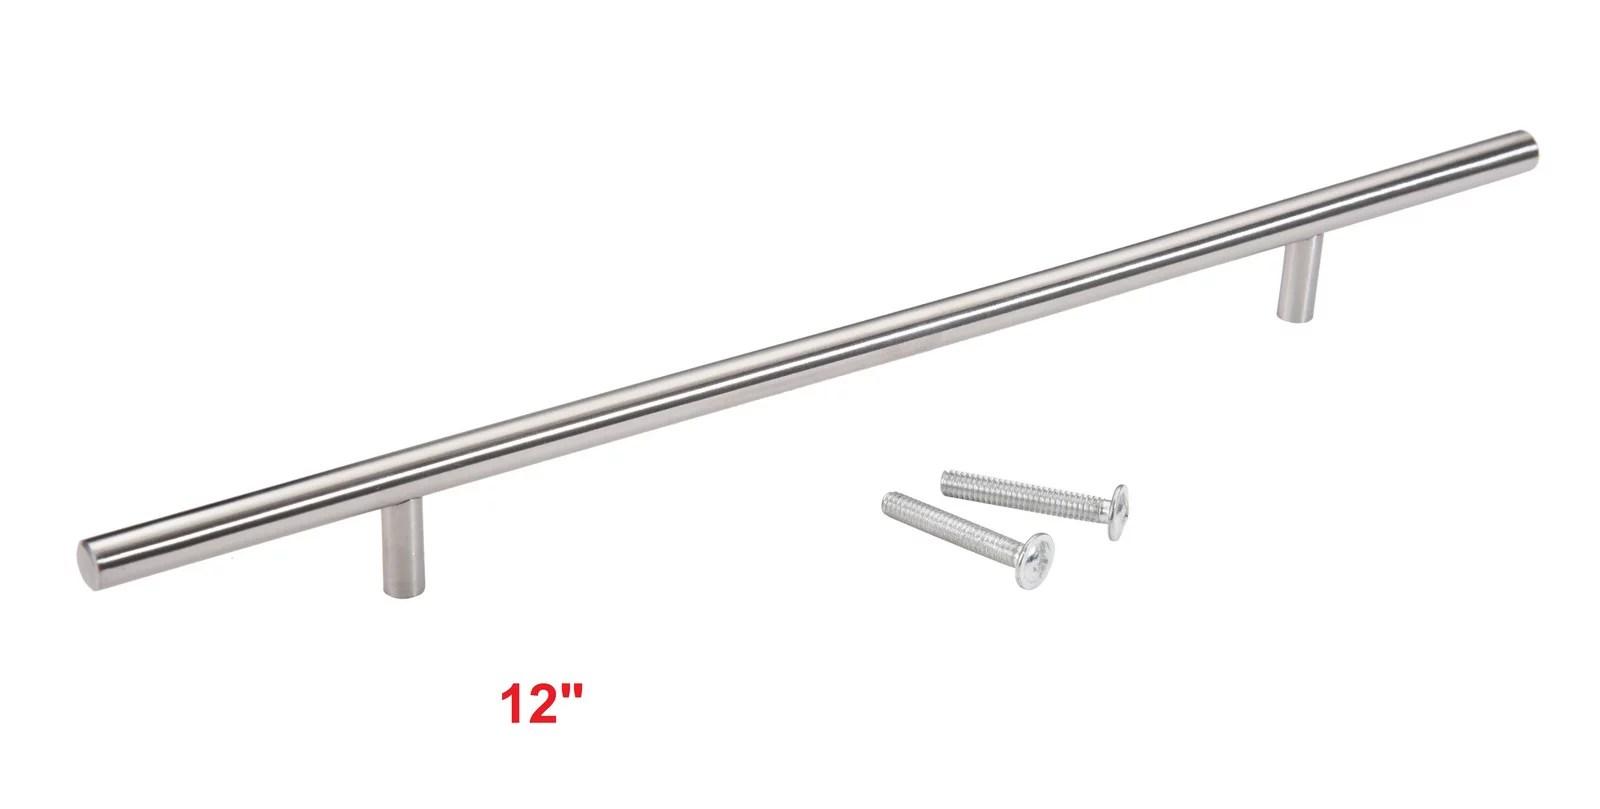 Stainless Steel T Bar Kitchen Cabinet Door Hardware Pulls